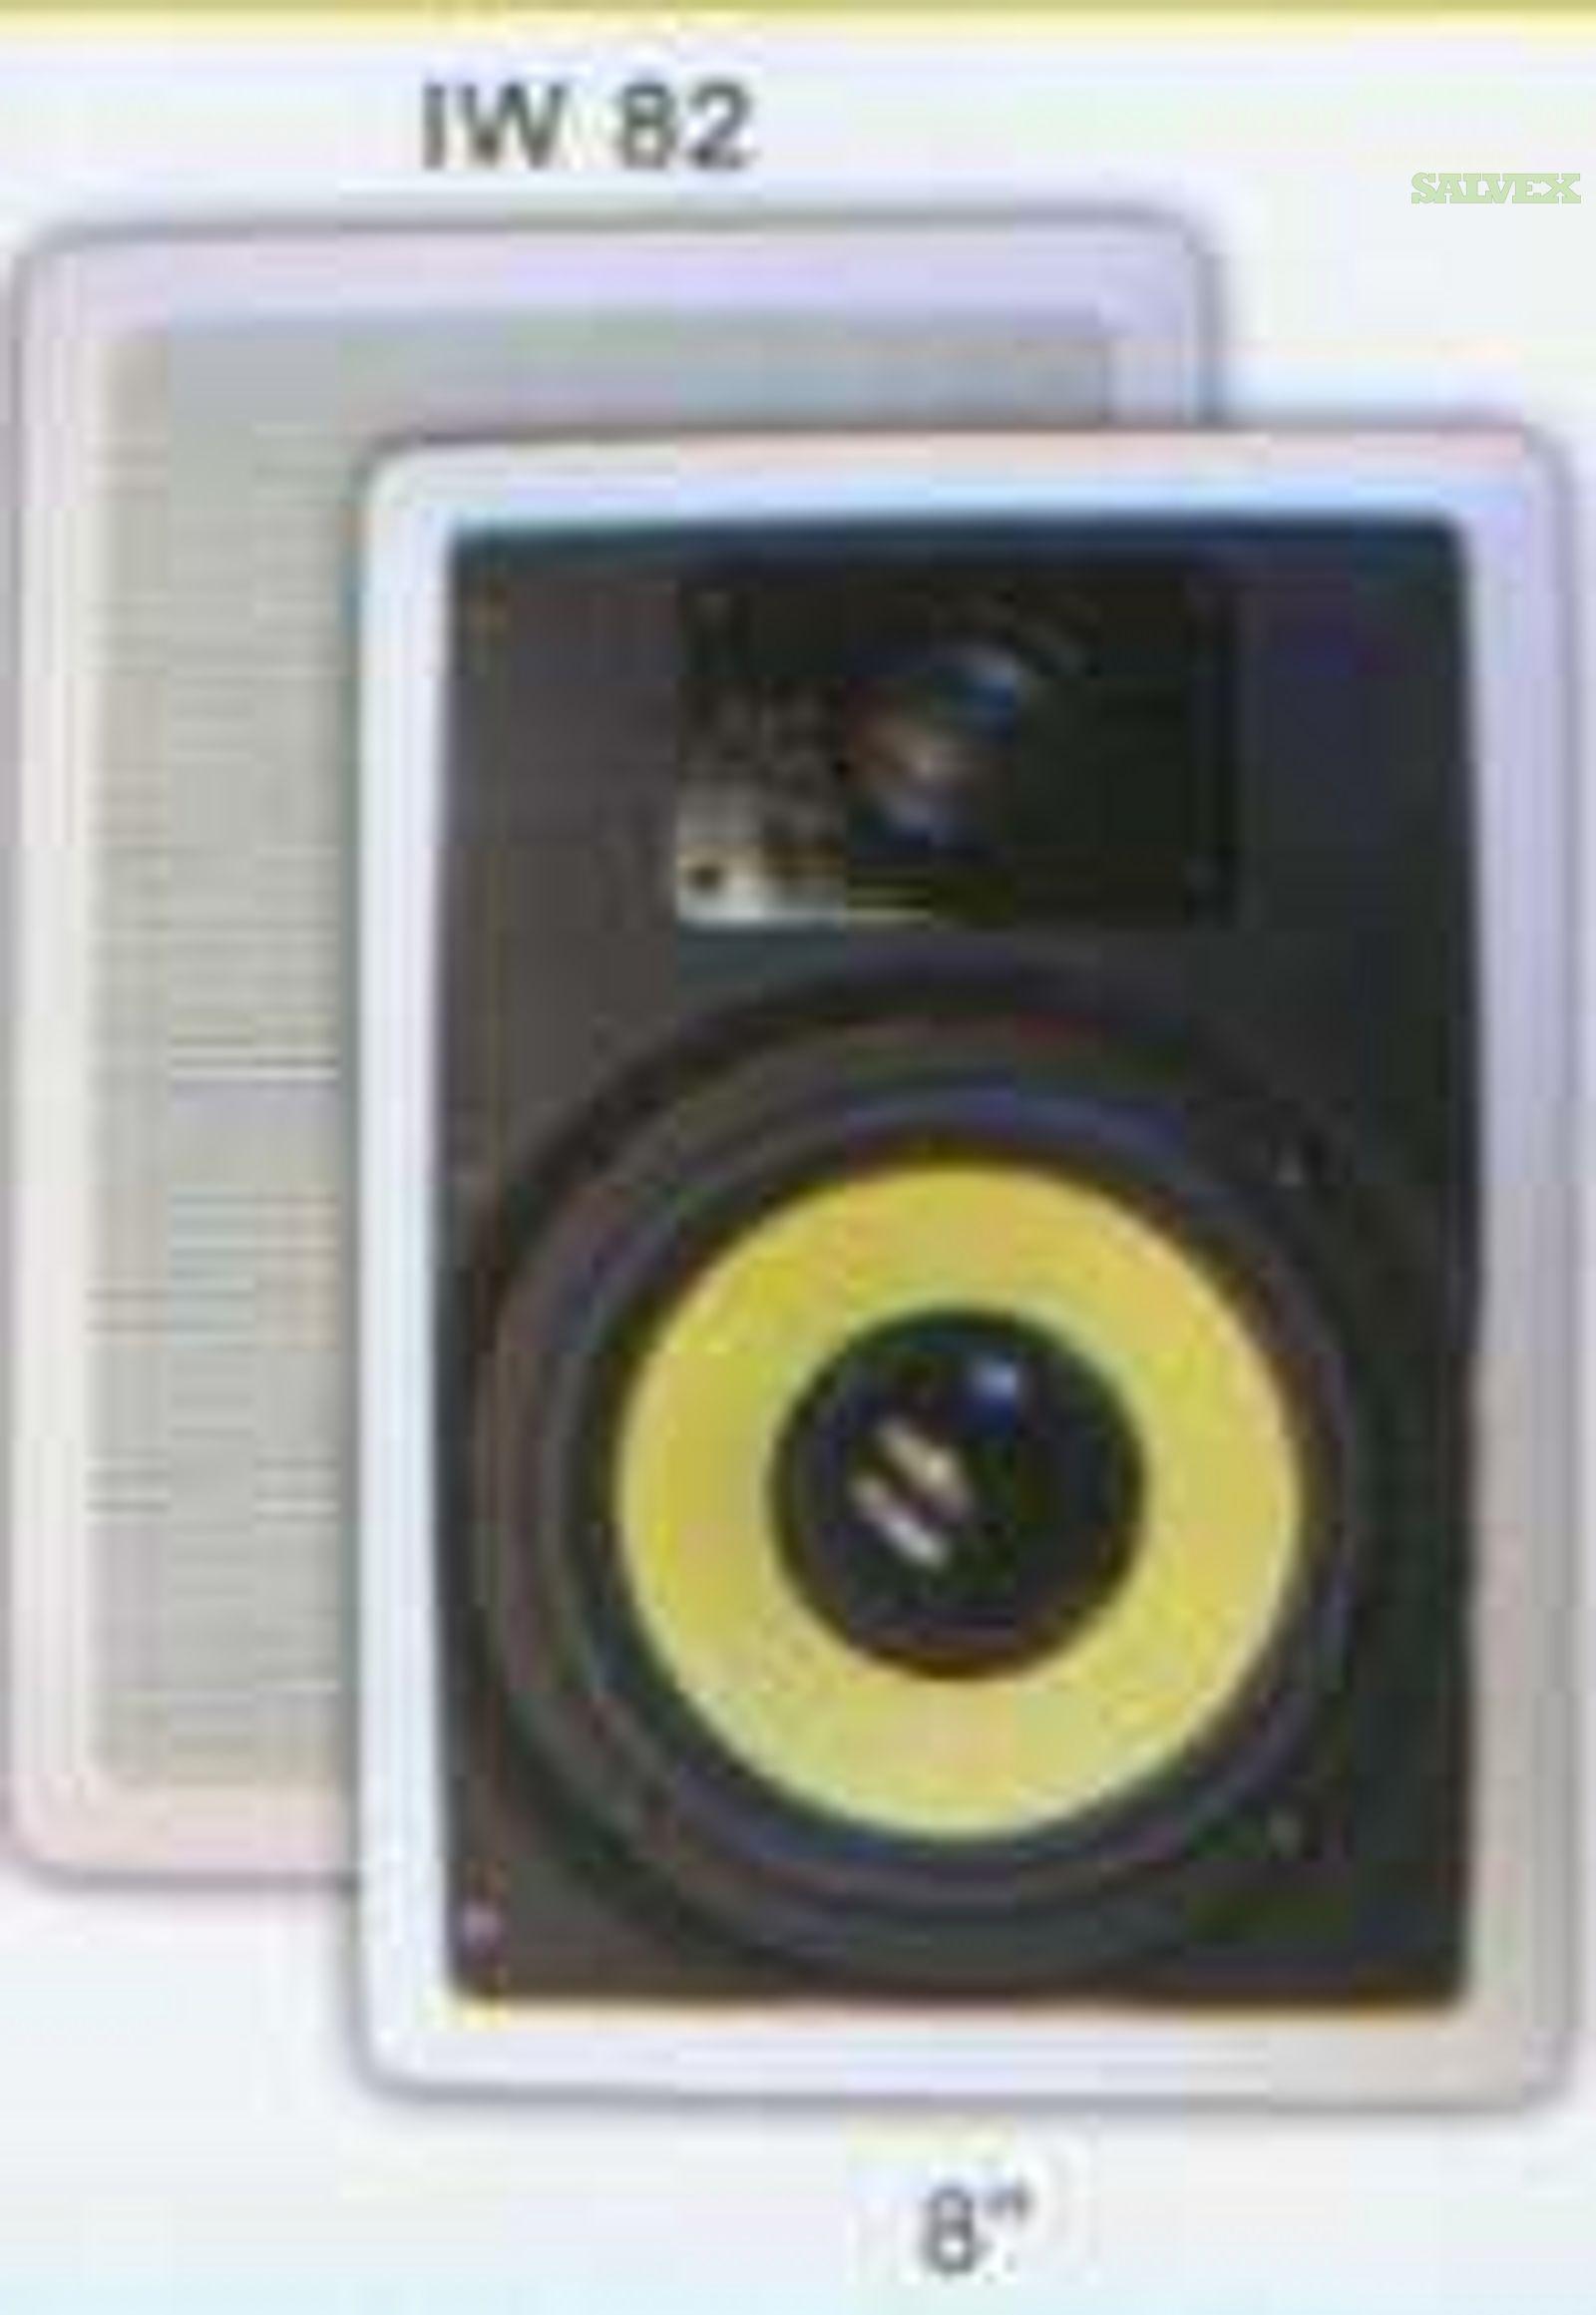 Audio Loudspeakers, Audio Volume Control, In-wall/in Ceiling Audio Speaker And Speaker Stands (1 Lot)